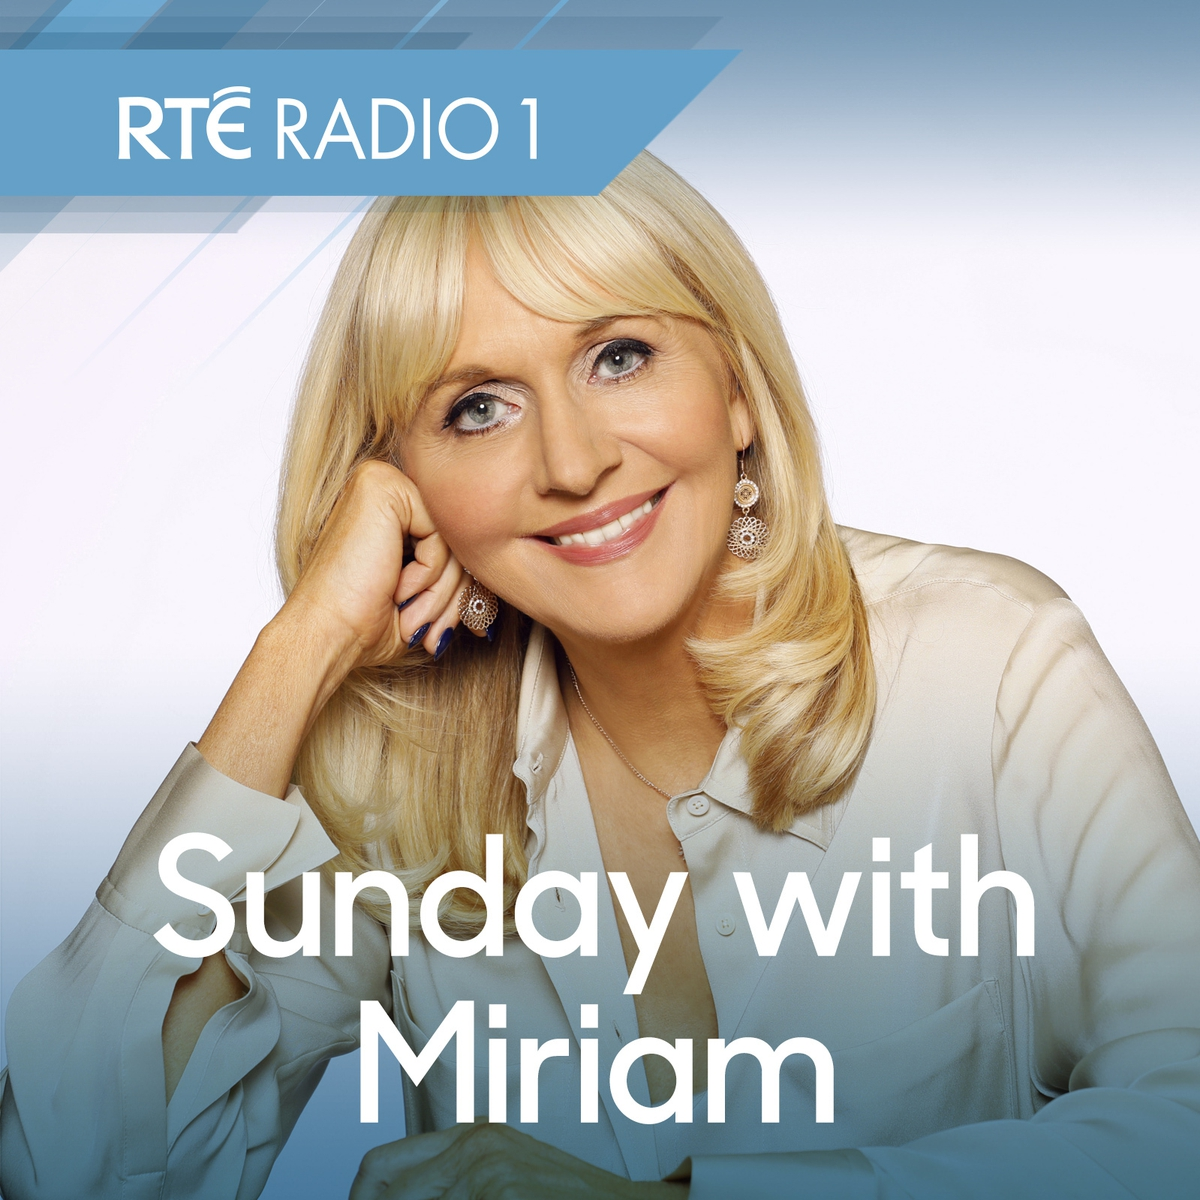 Sunday with Miriam